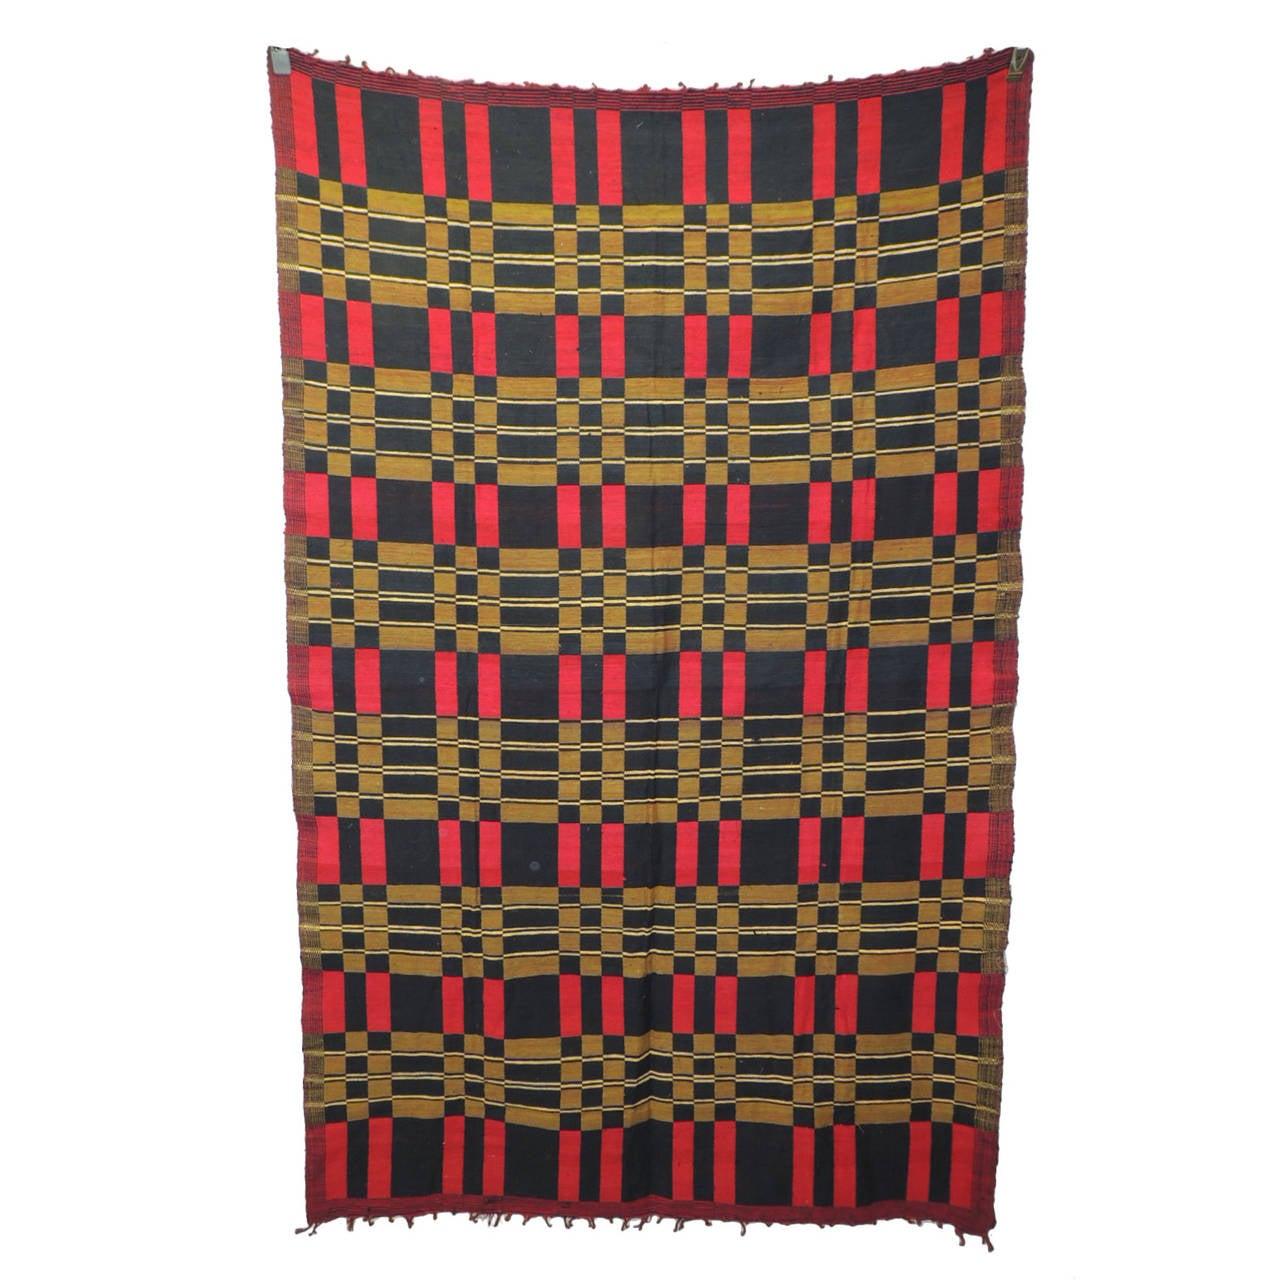 CLOSE OUT SALE: African Adire Antique Artisanal Textile